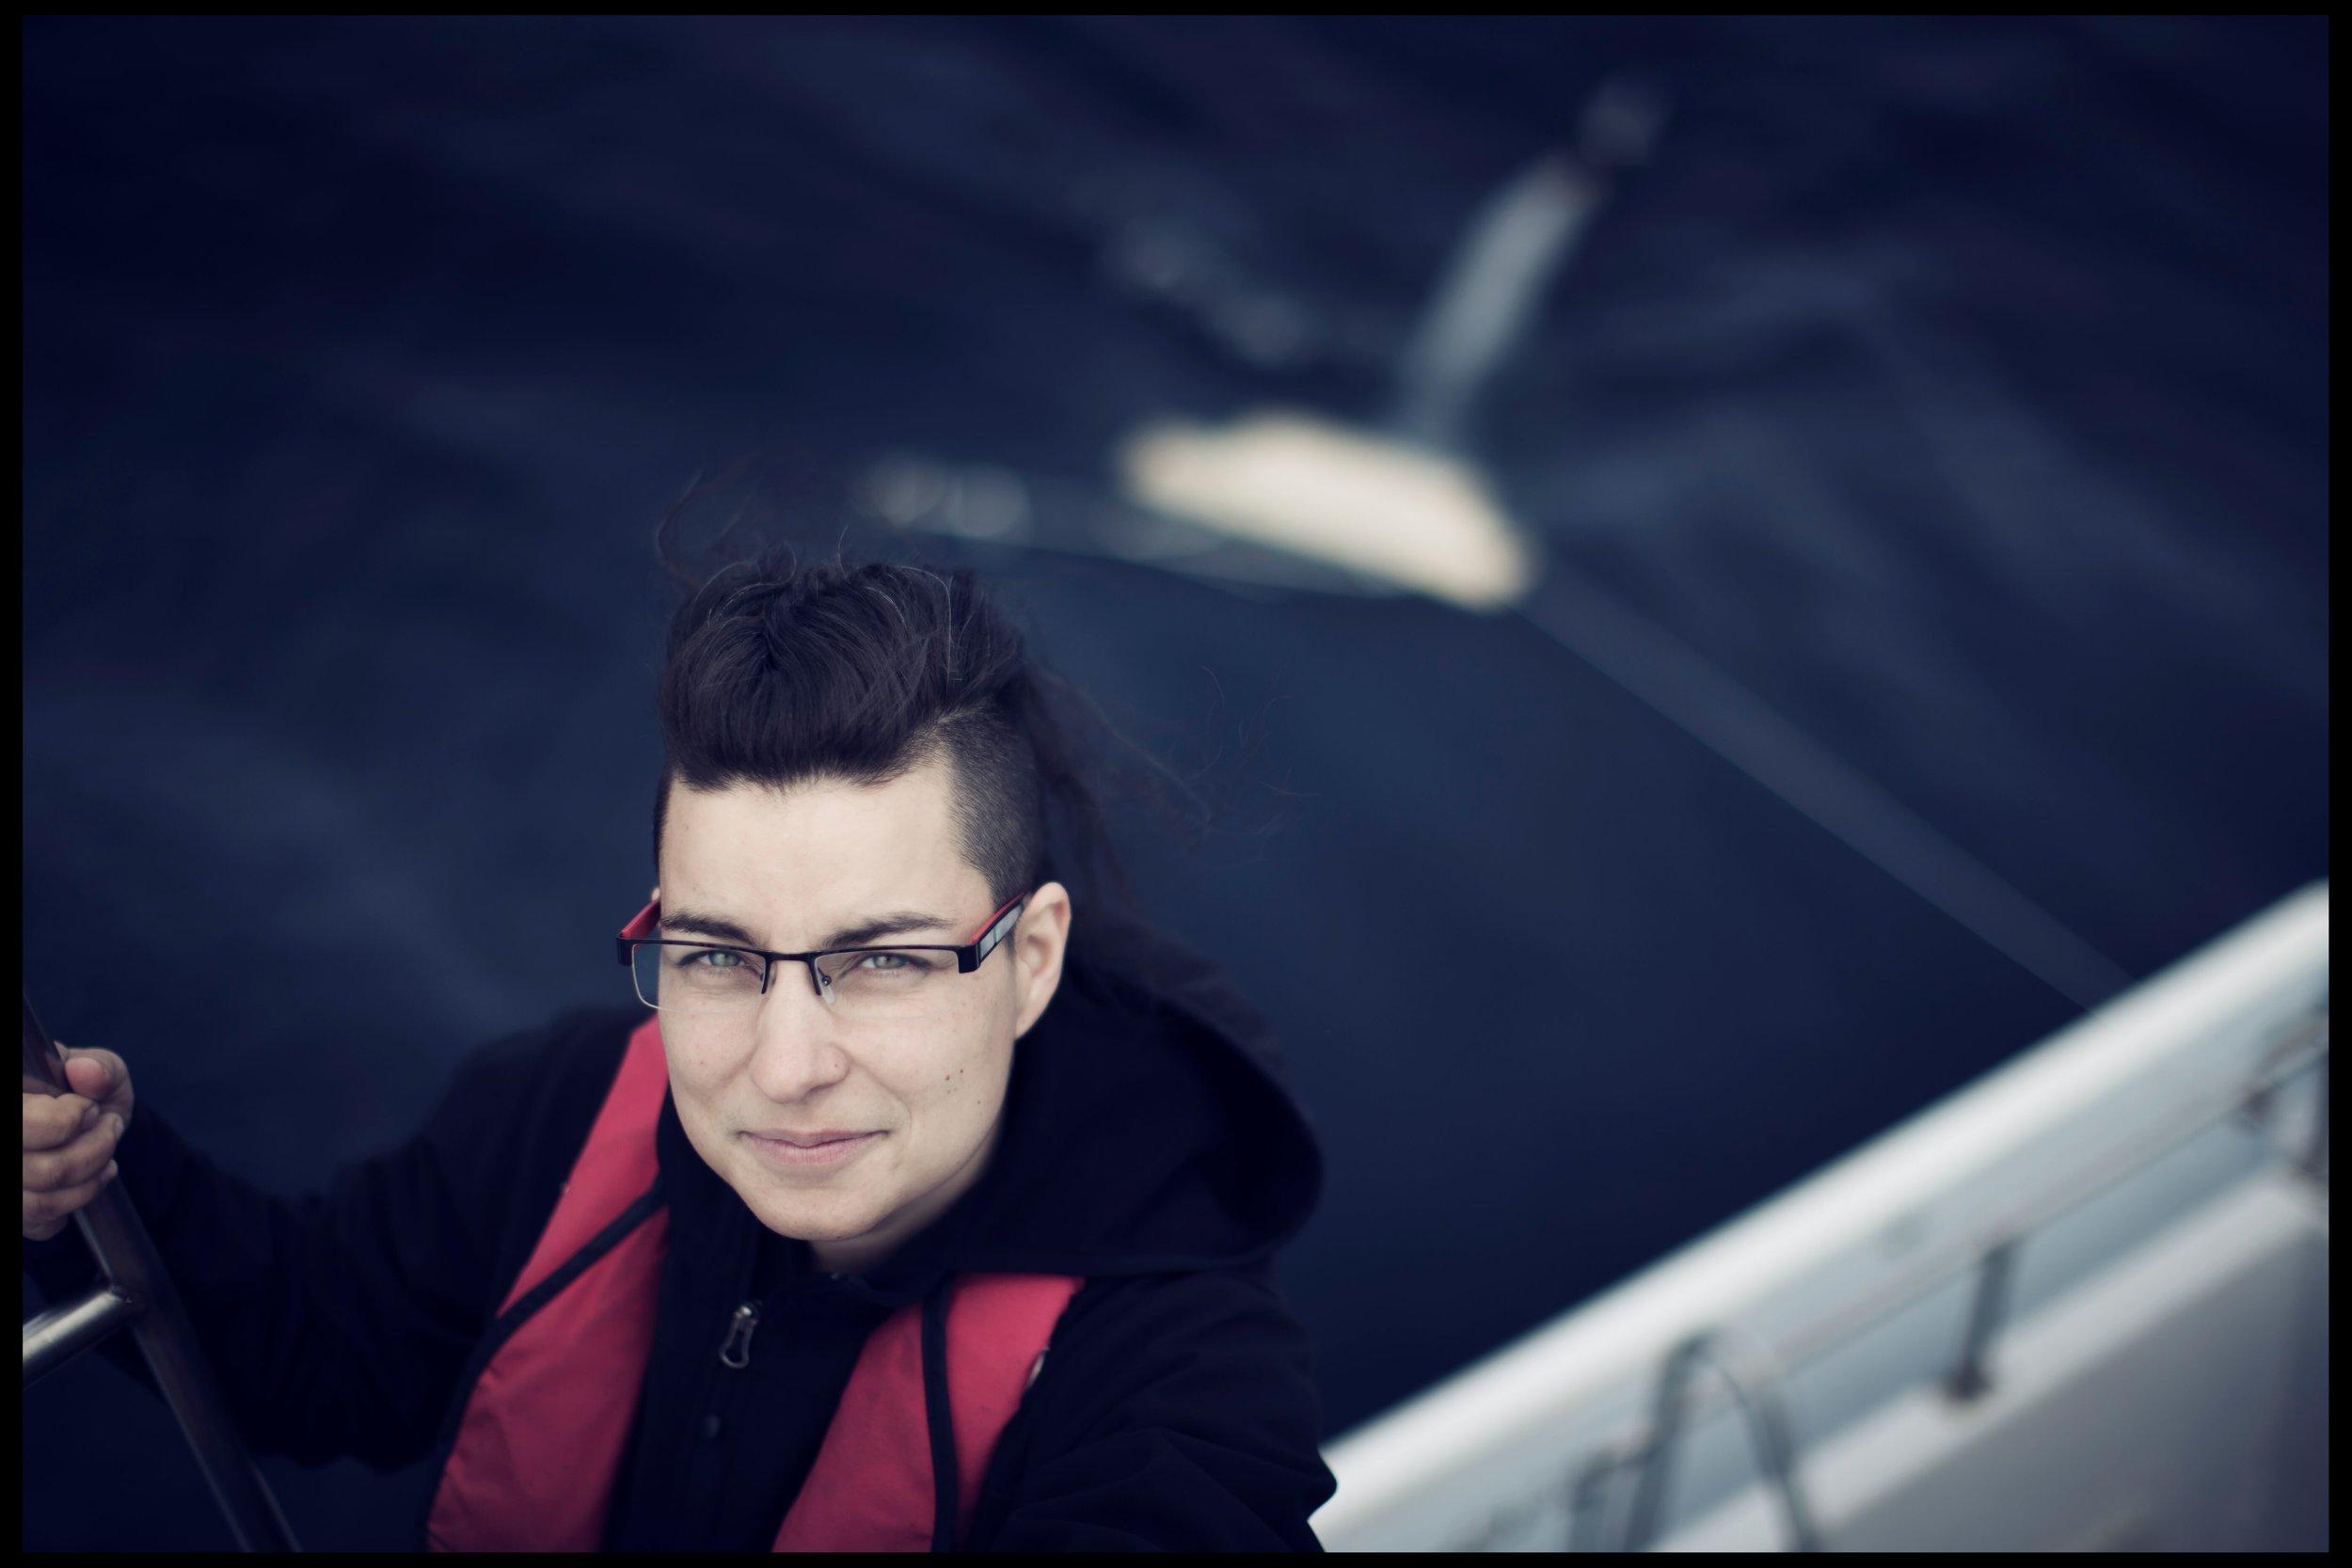 Max Liboiron_Headshot.jpeg